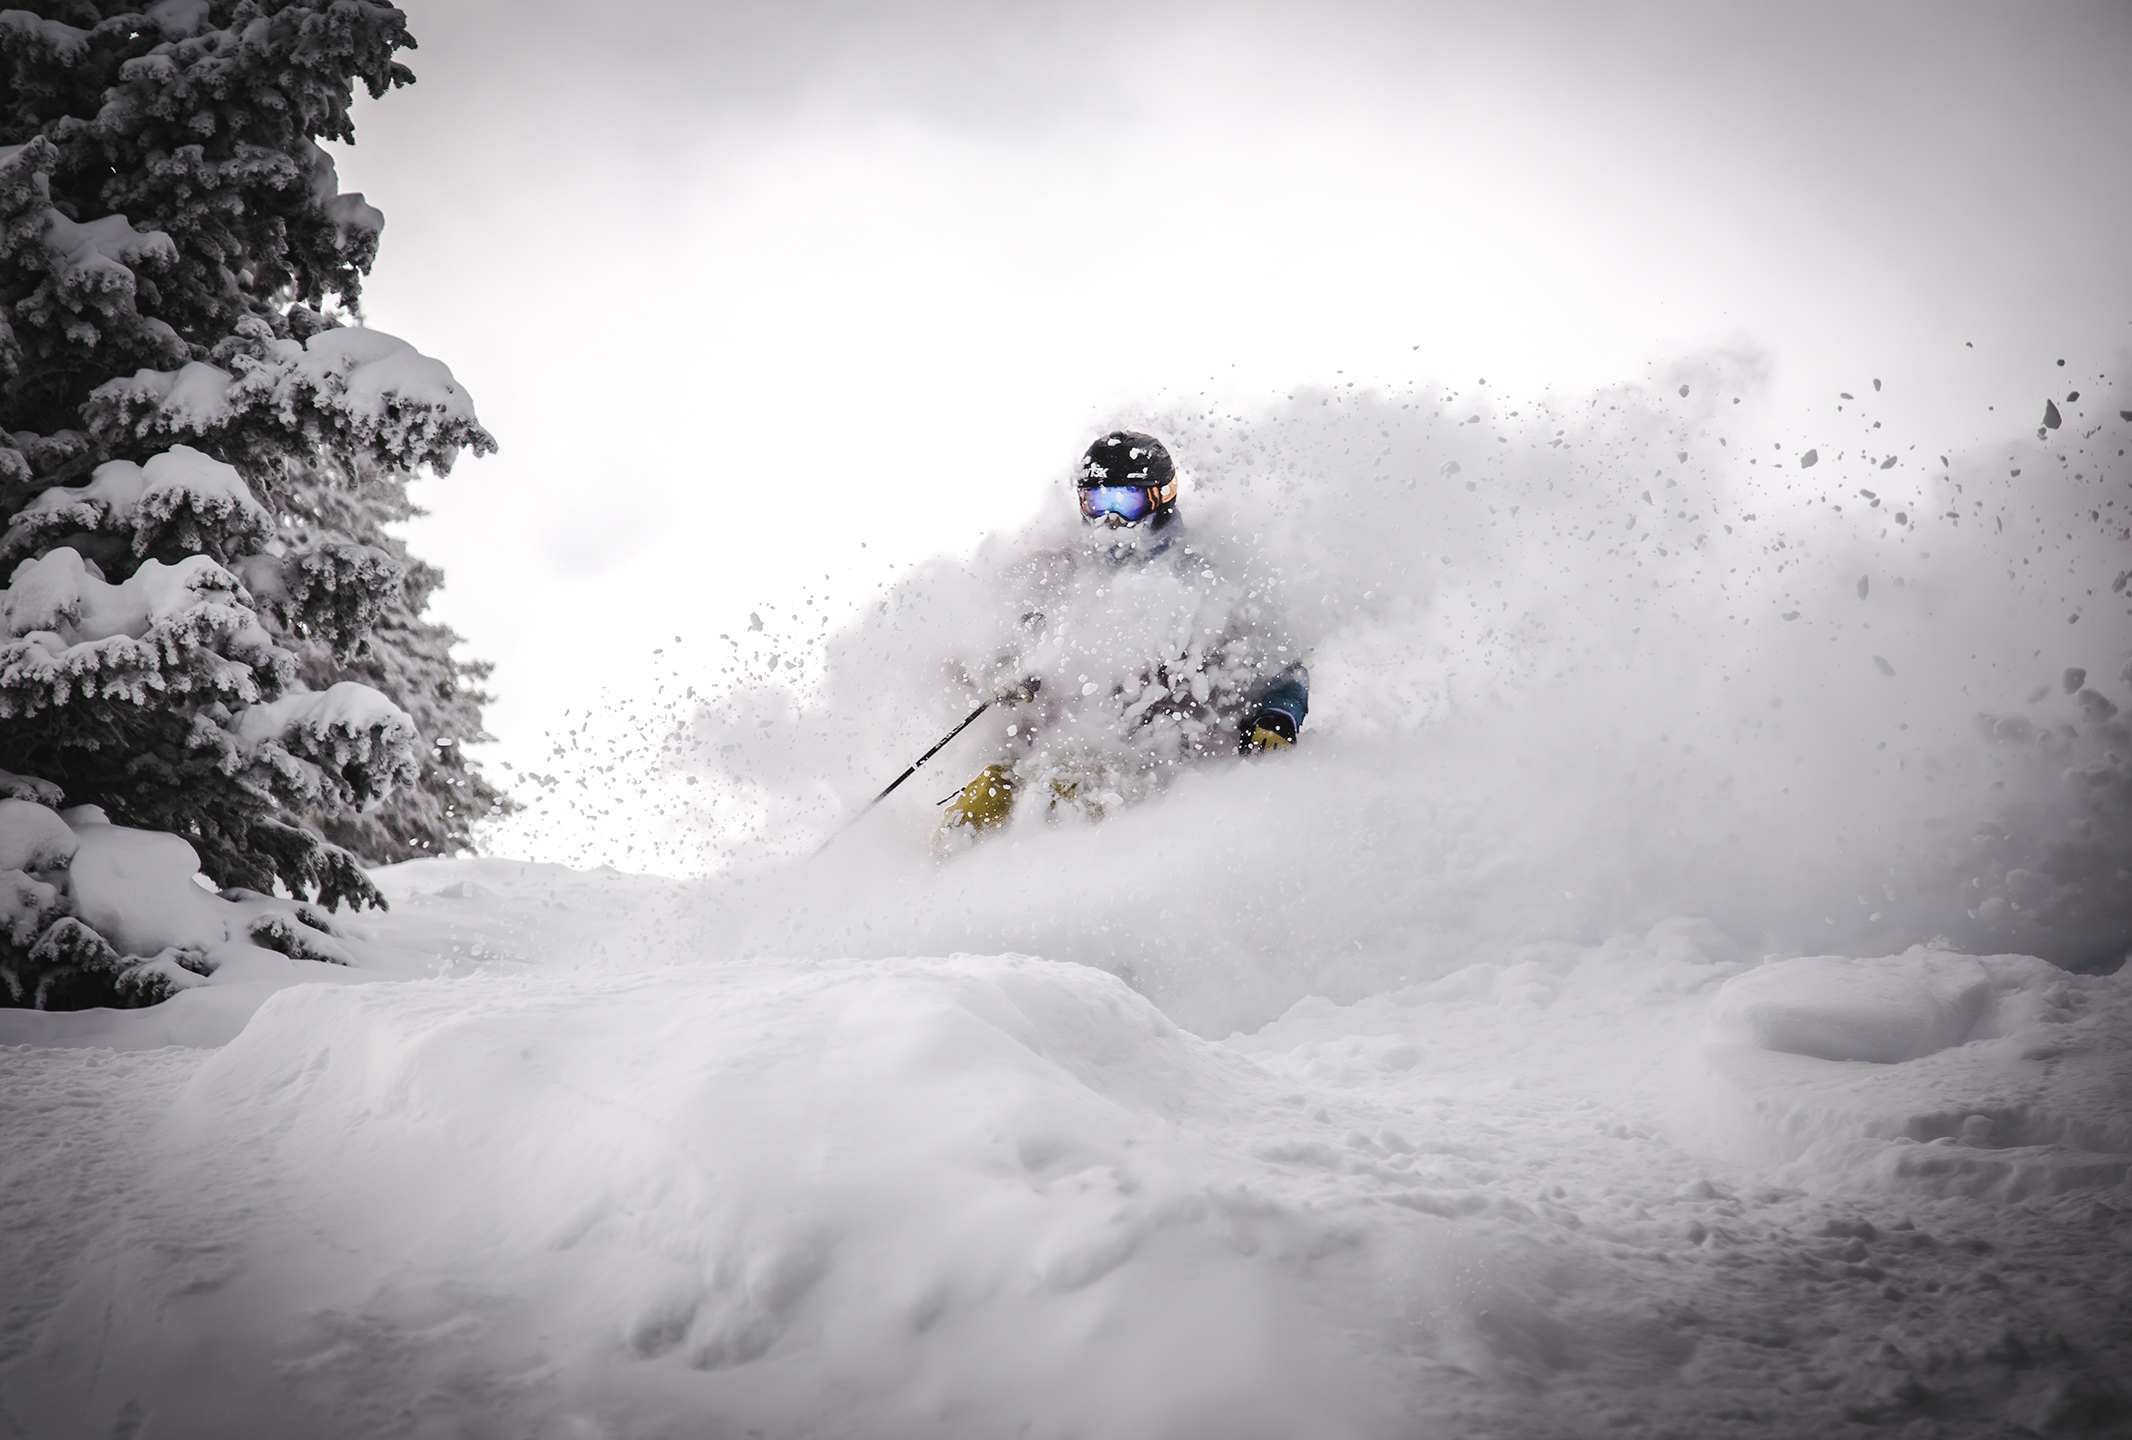 Vail Mountain - Vail, Colorado // Skier: Ryan Downing // Photographer: Jason Wilson //Canon 5D Mark III + Canon 24-105mm f/4L // ISO 100, f/4, 1/640